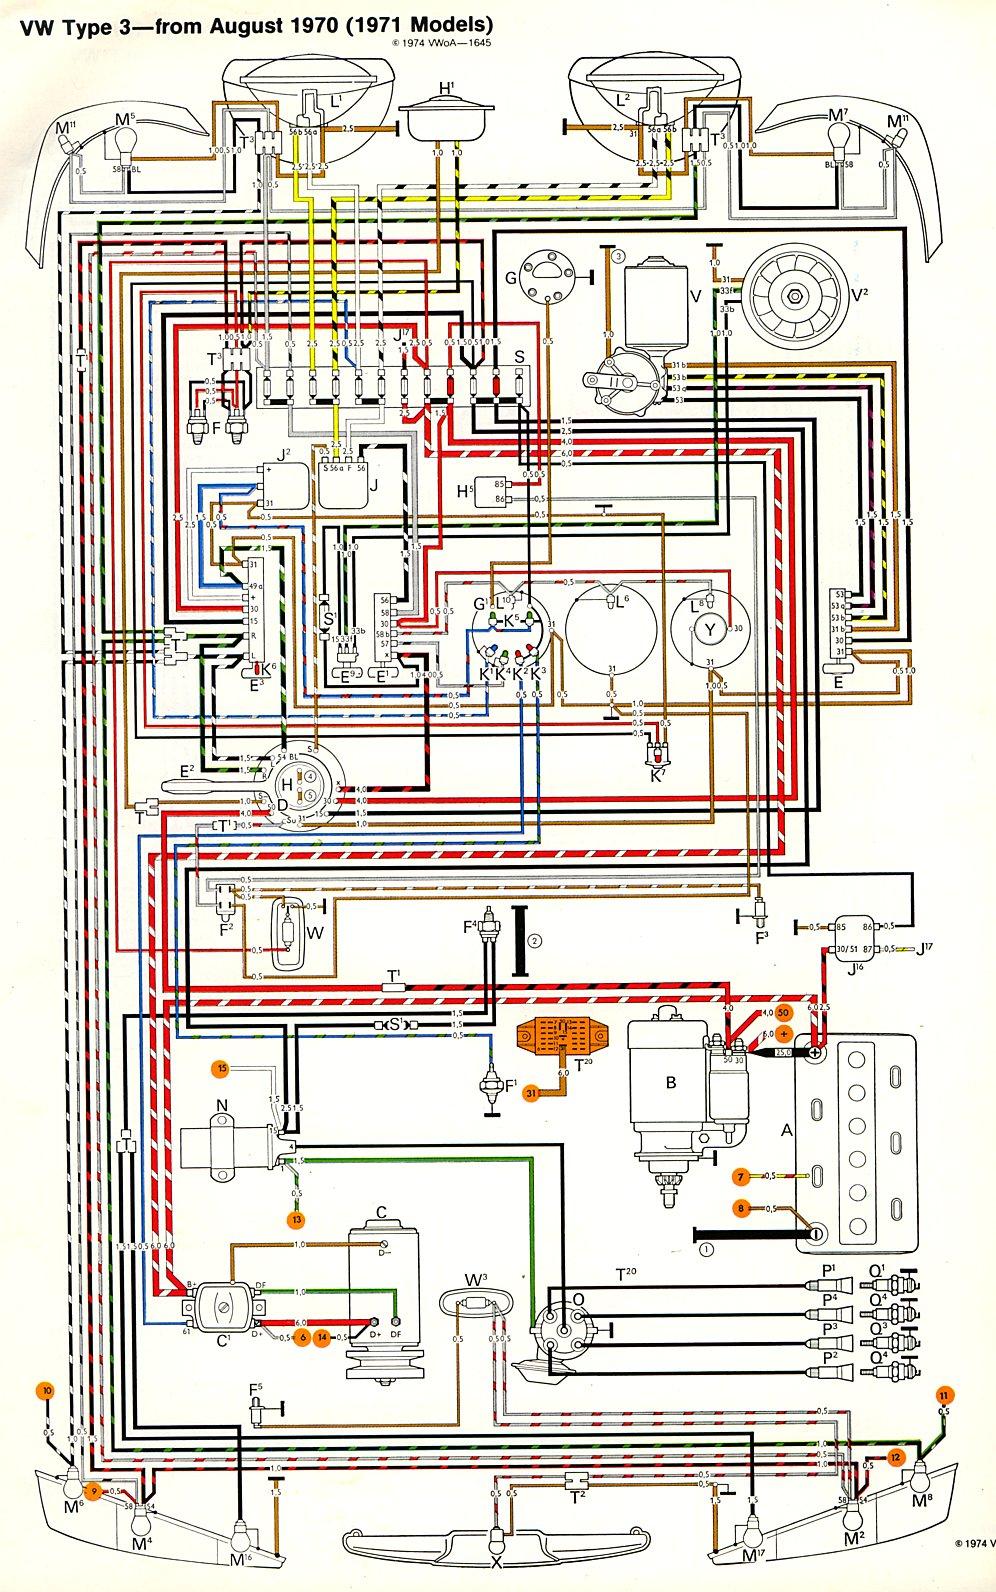 1971 Dodge Wiring Diagram Thesamba Com Type 3 Wiring Diagrams